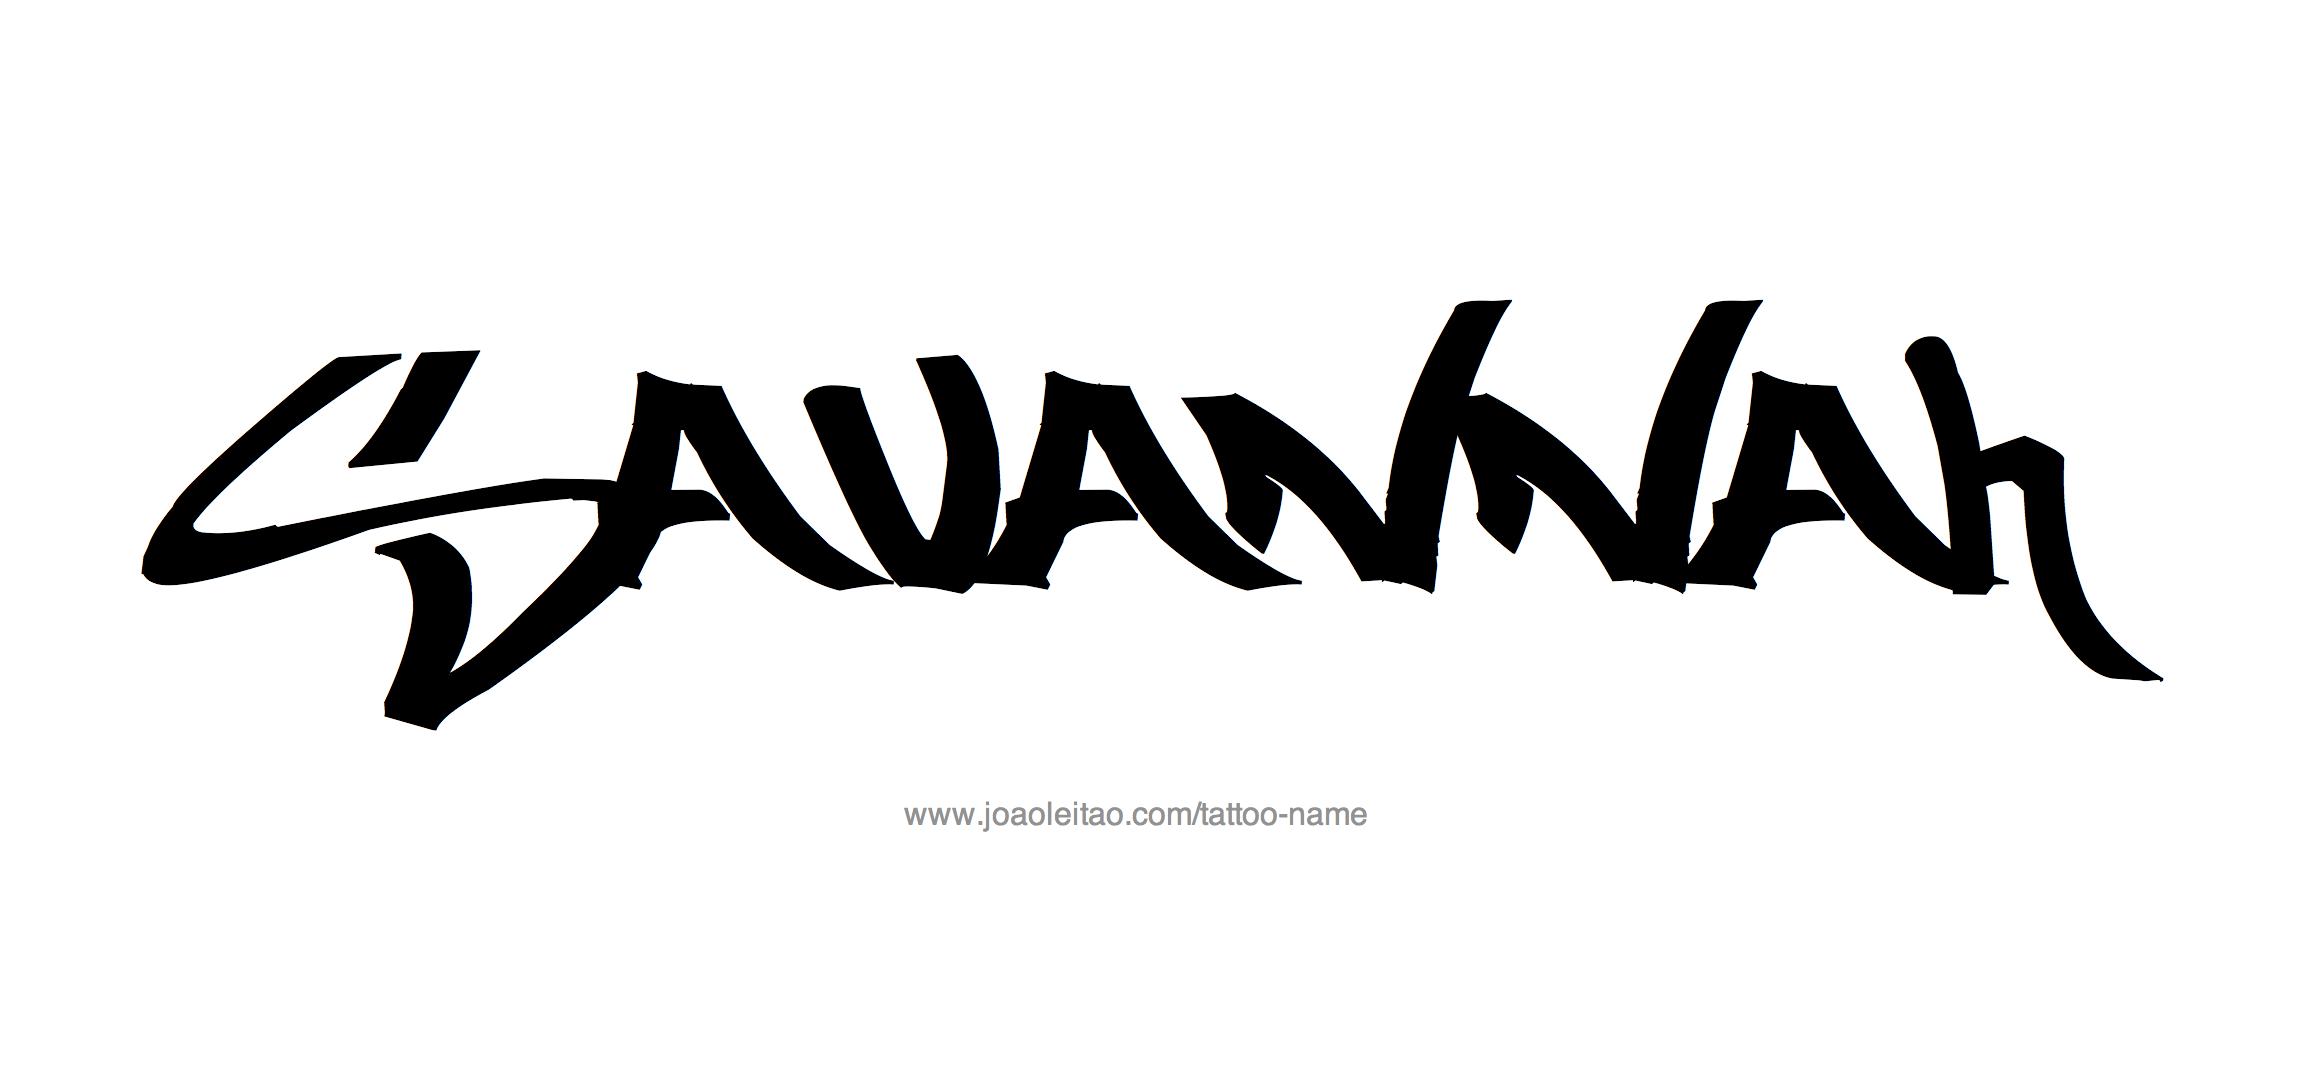 %name%: Savannah Name Tattoo Designs